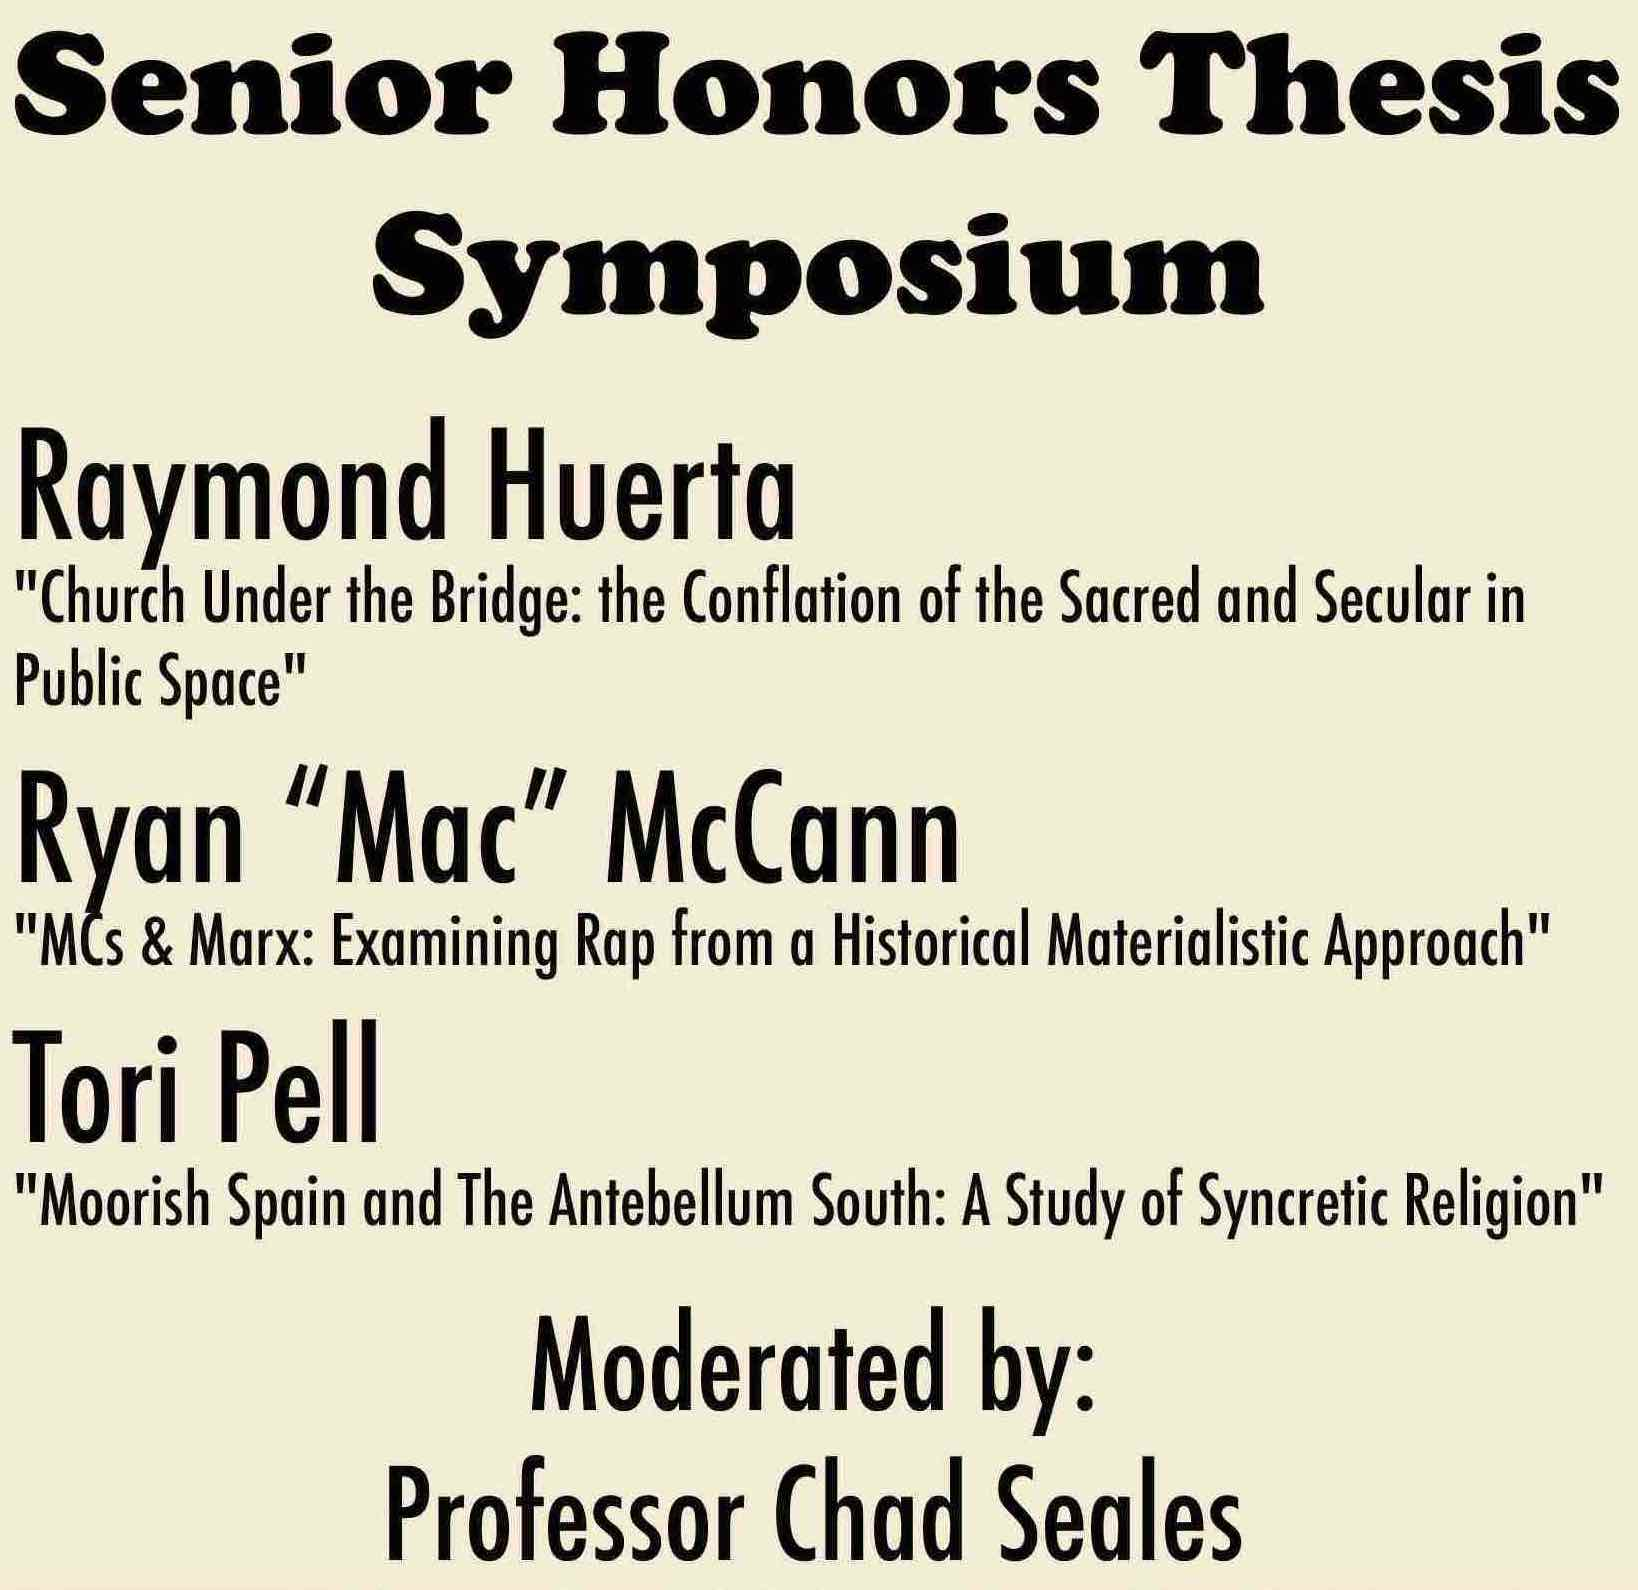 RS Thesis Symposium Program